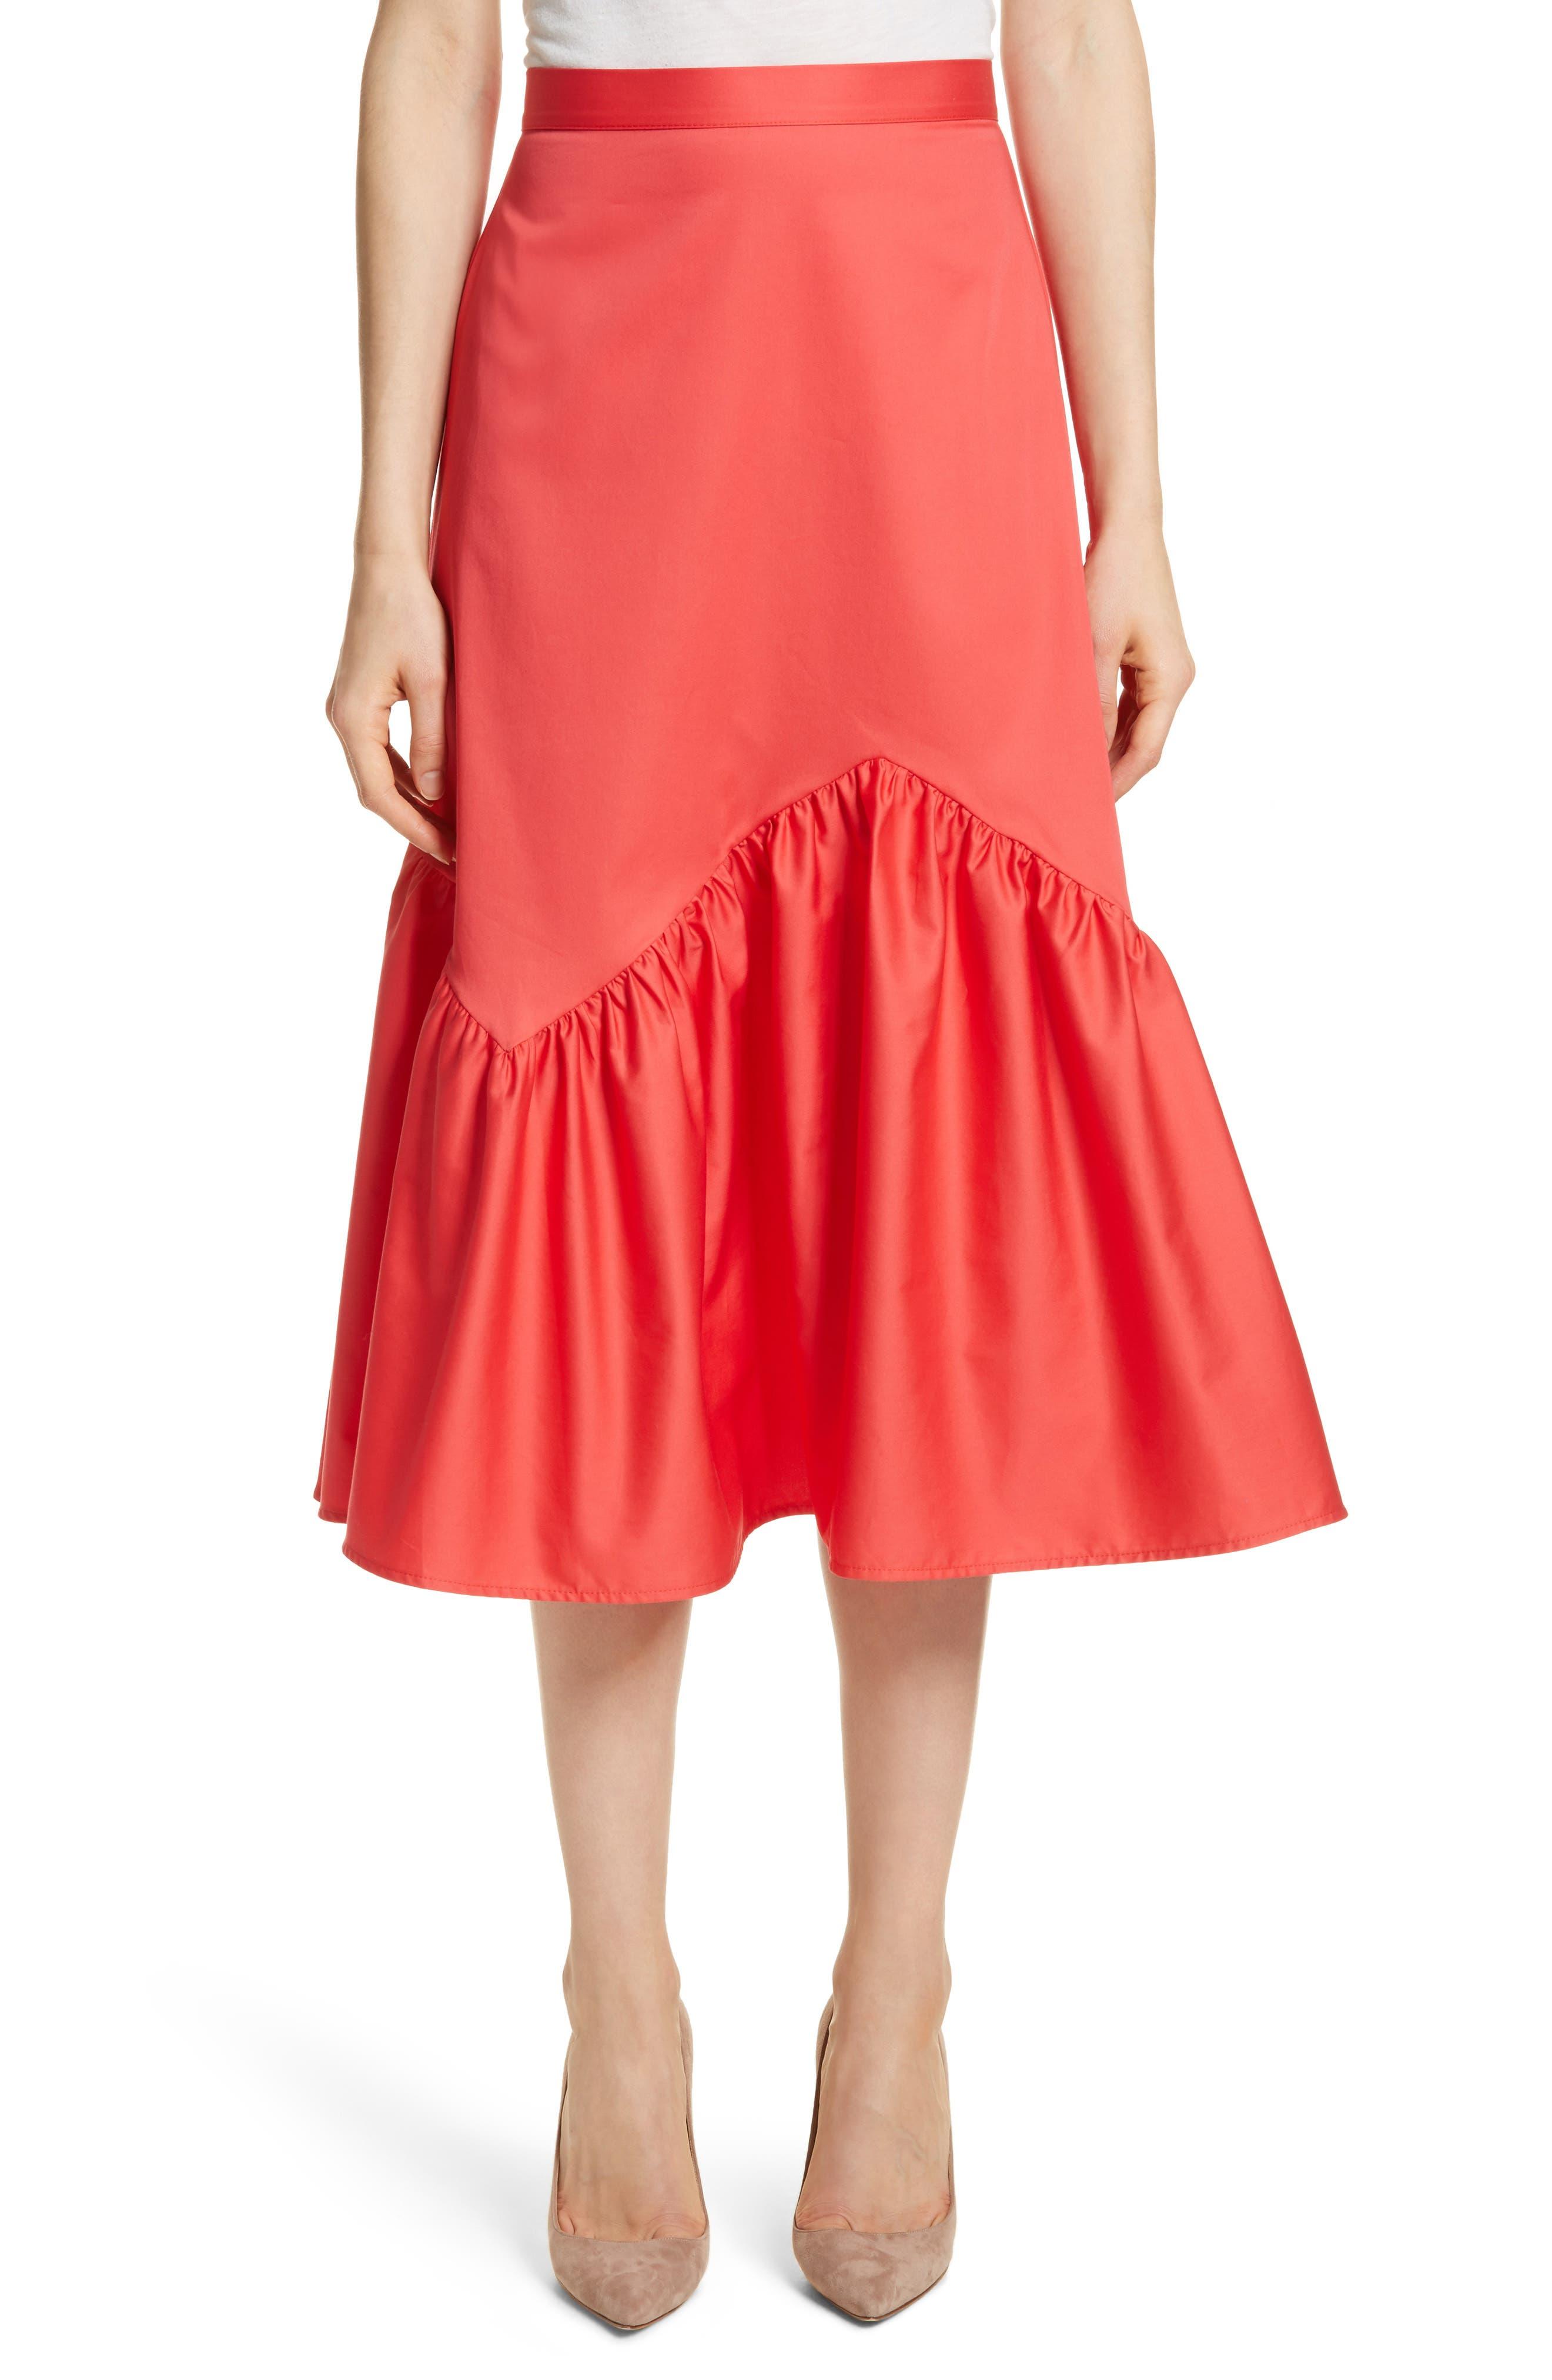 Prose & Poetry Tyra Midi Skirt,                             Main thumbnail 1, color,                             621